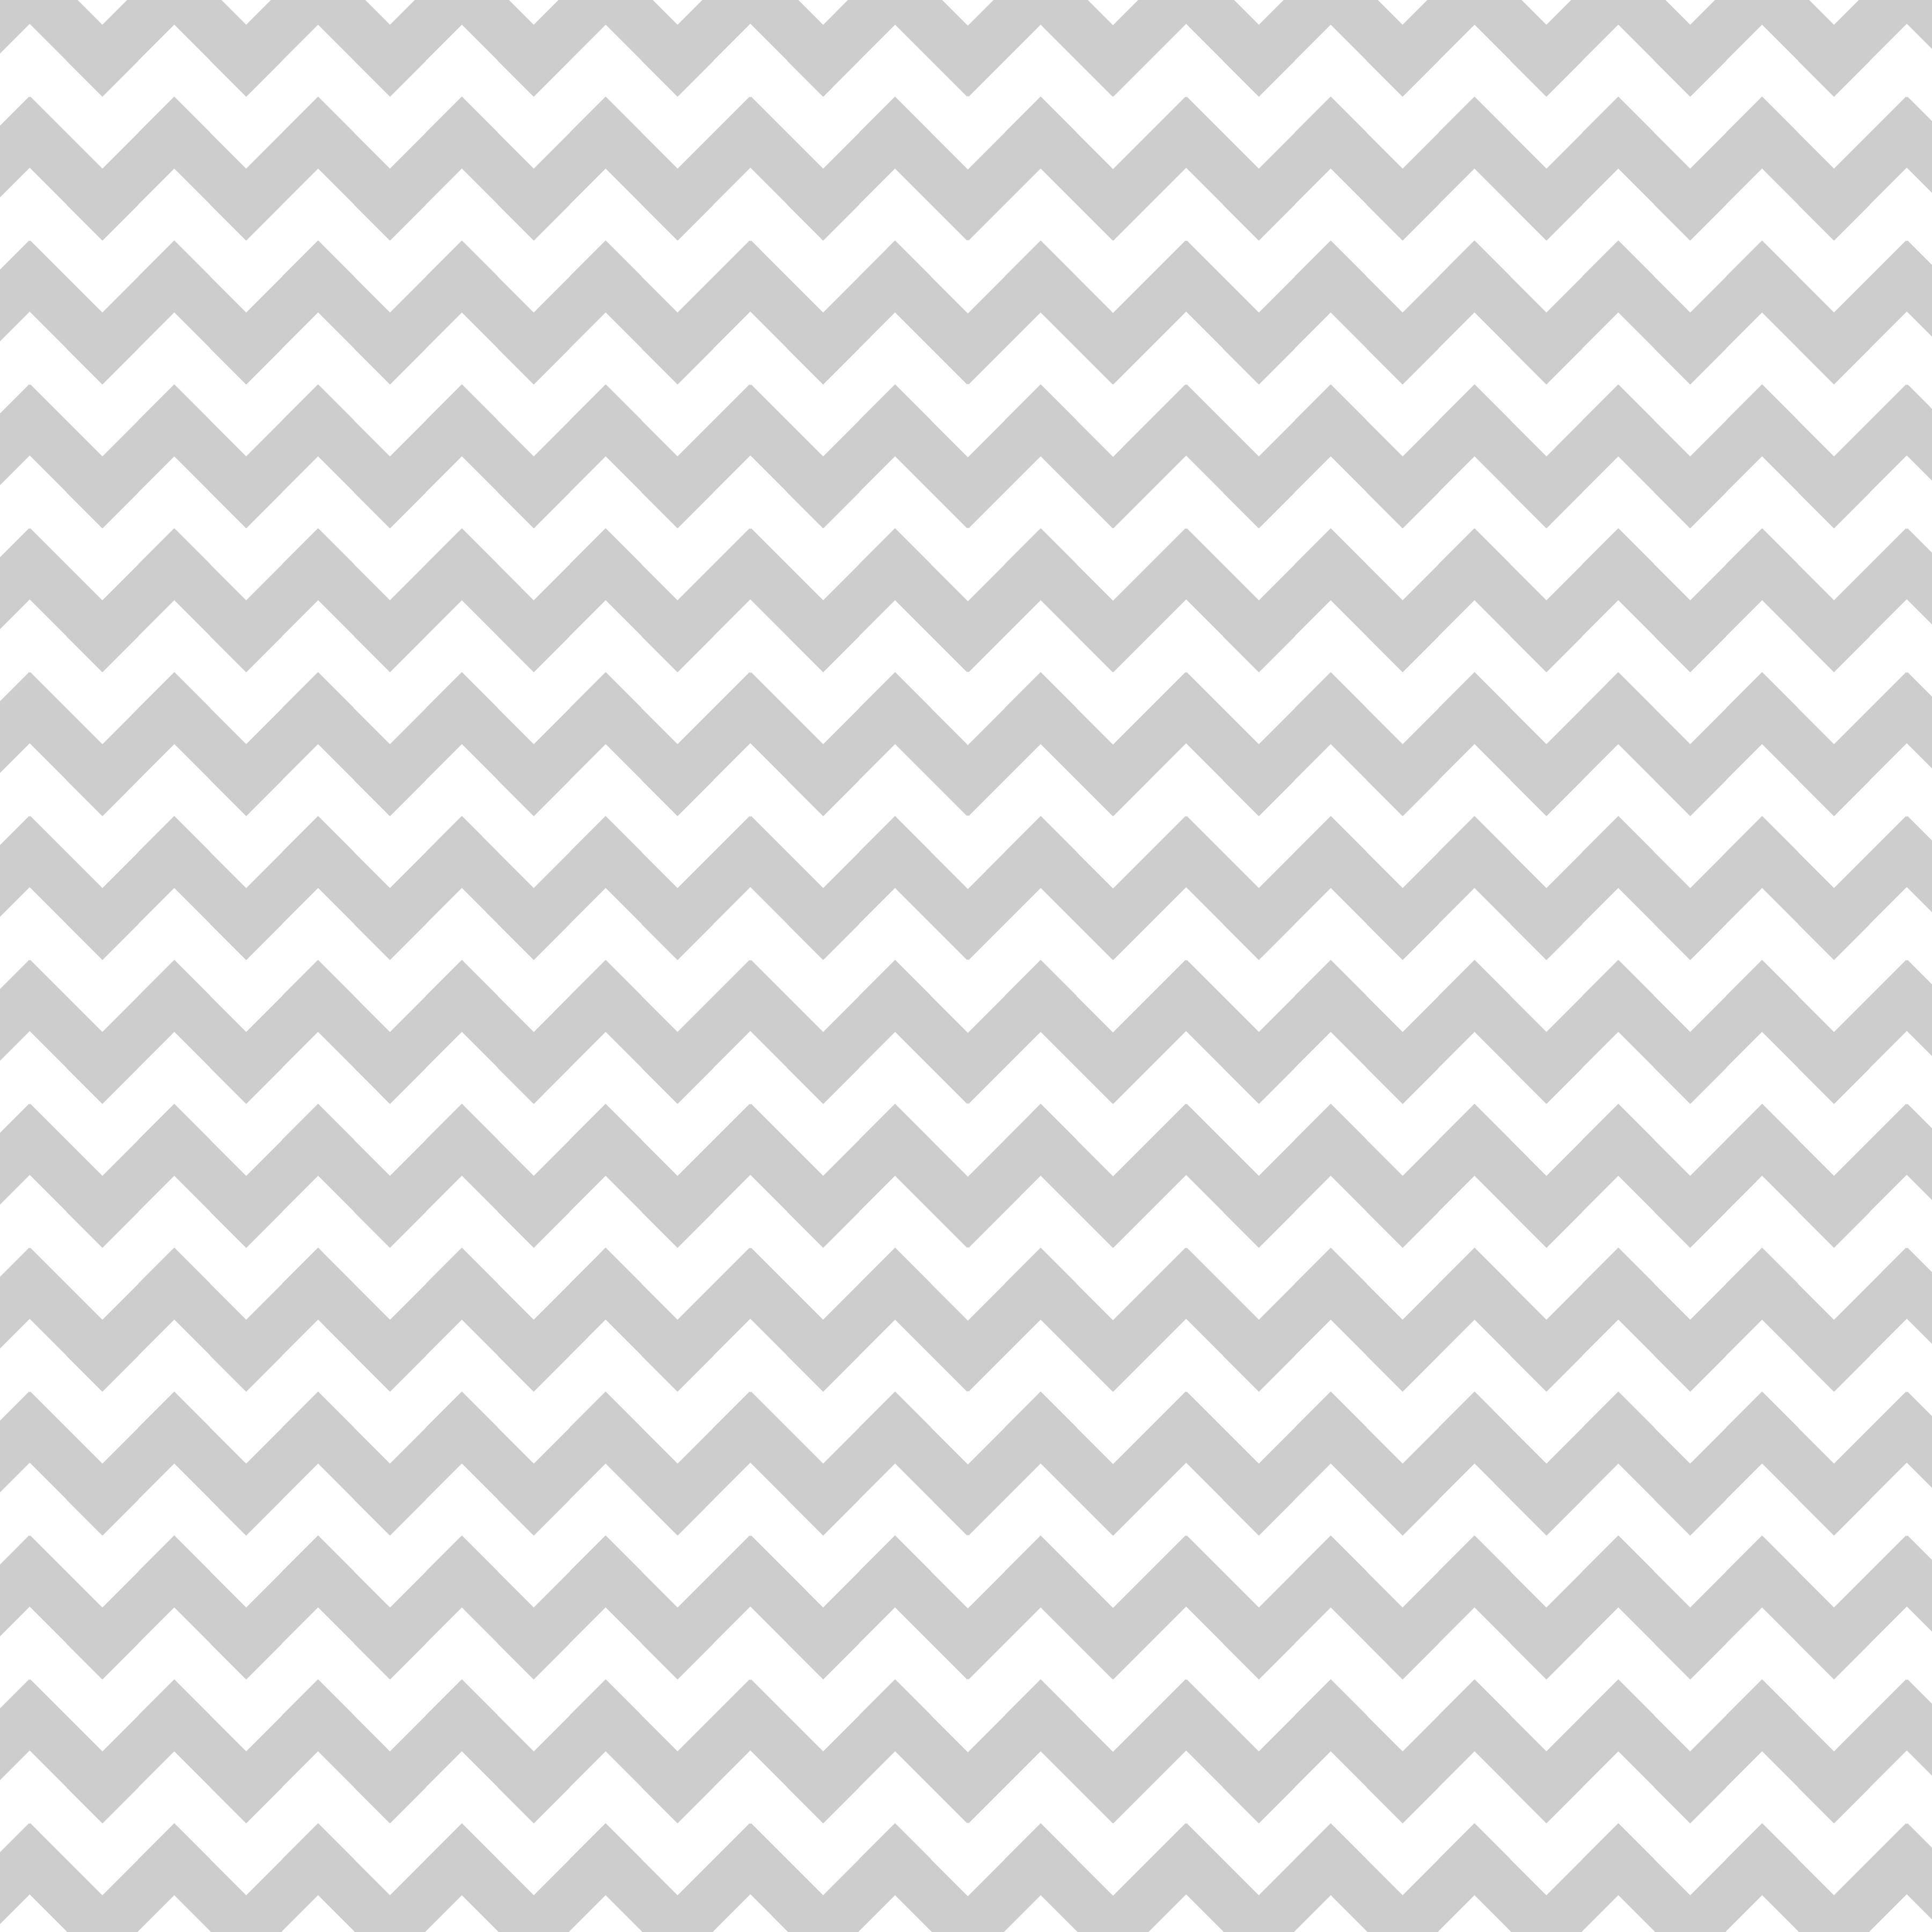 Chevron Digital Paper Download 3600x3600